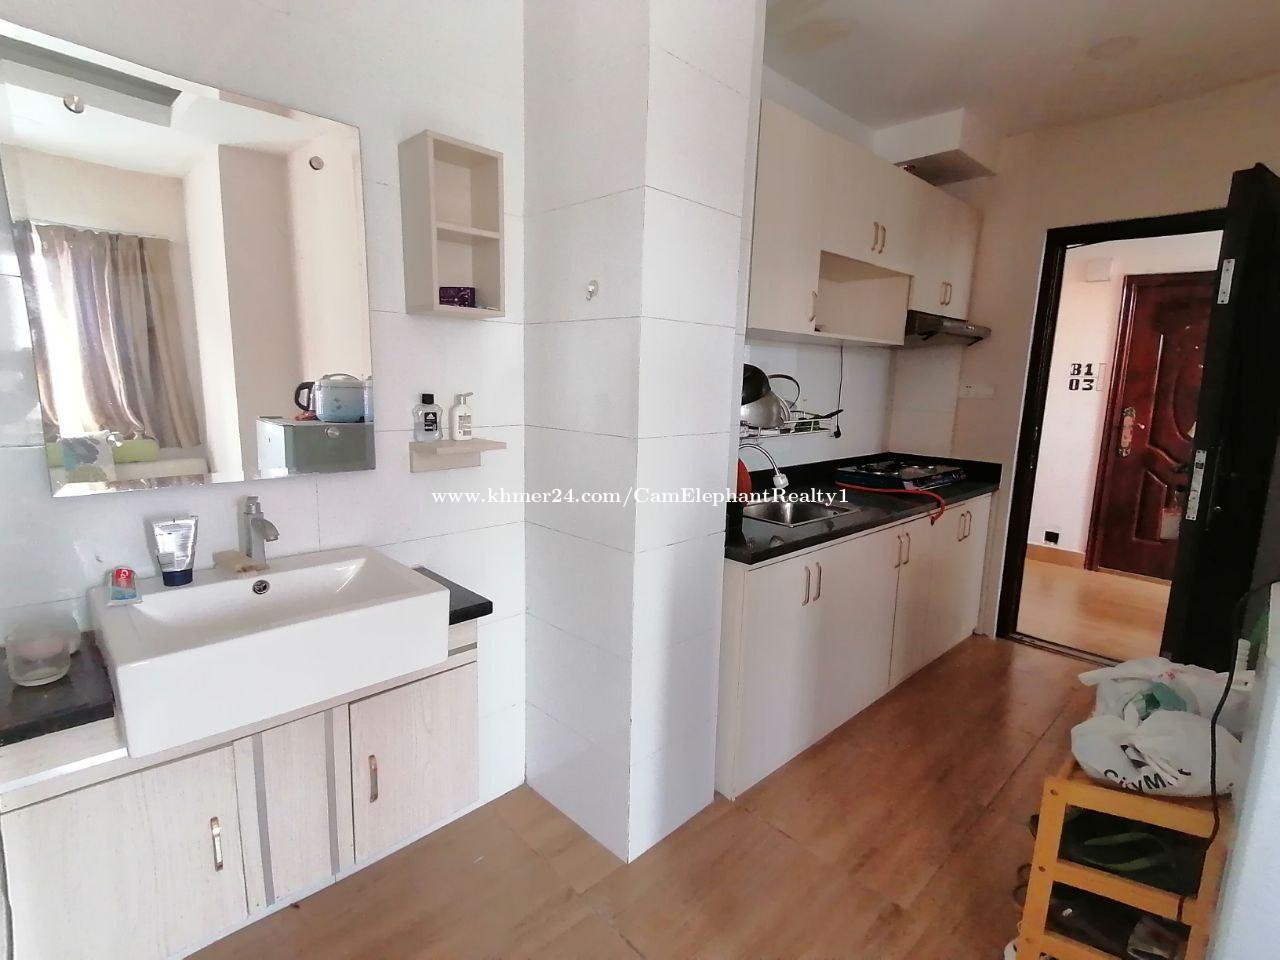 Condo for Rent in Boeung Trabek (1 Bedroom)